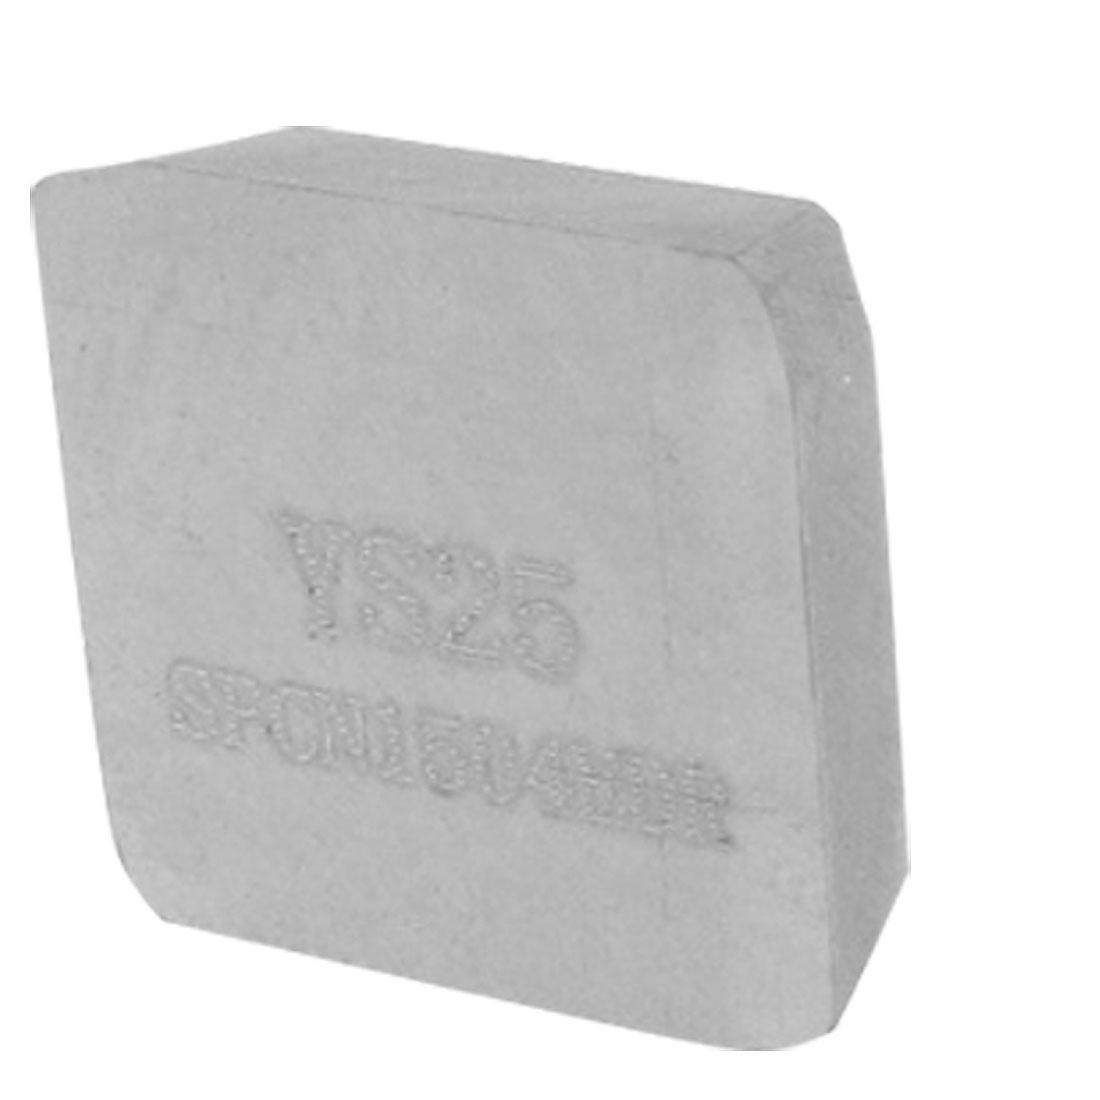 "Machine Milling 0.6"" Length Square Carbide Boring Insert 10 Pcs"